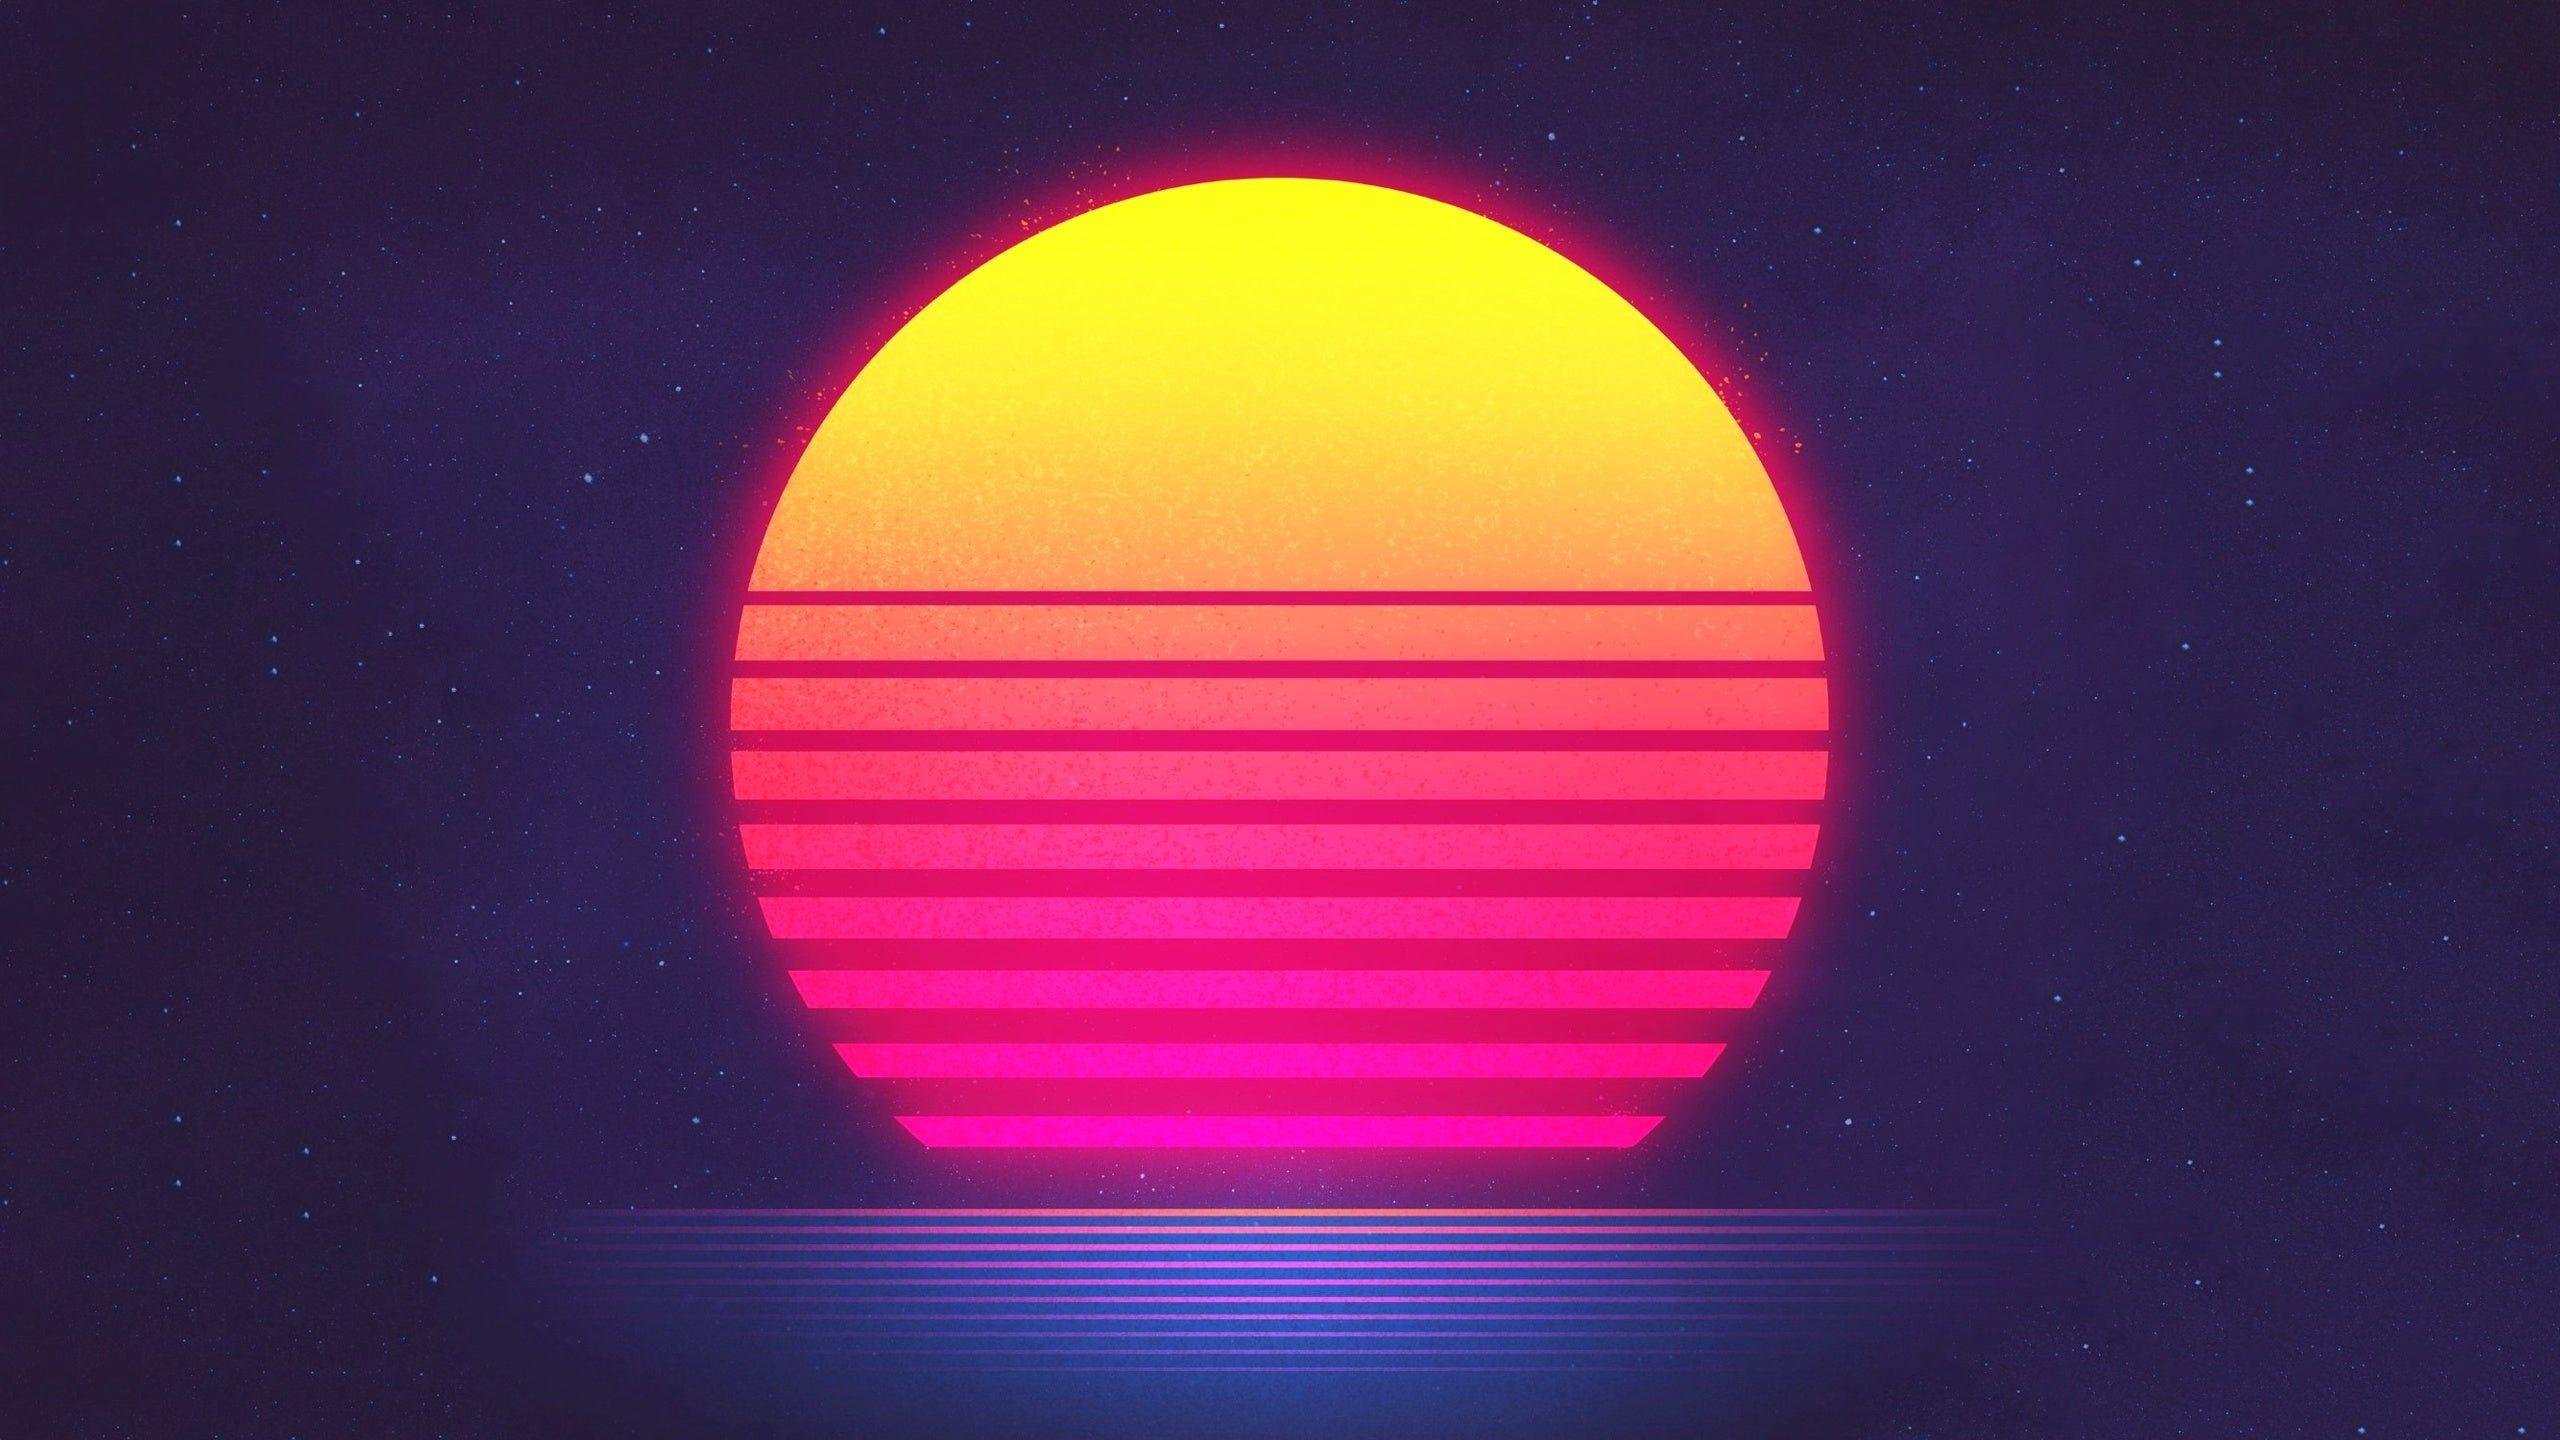 Sunset Retrowave Hd Wallpaper Retro Waves Synthwave Sun Illustration